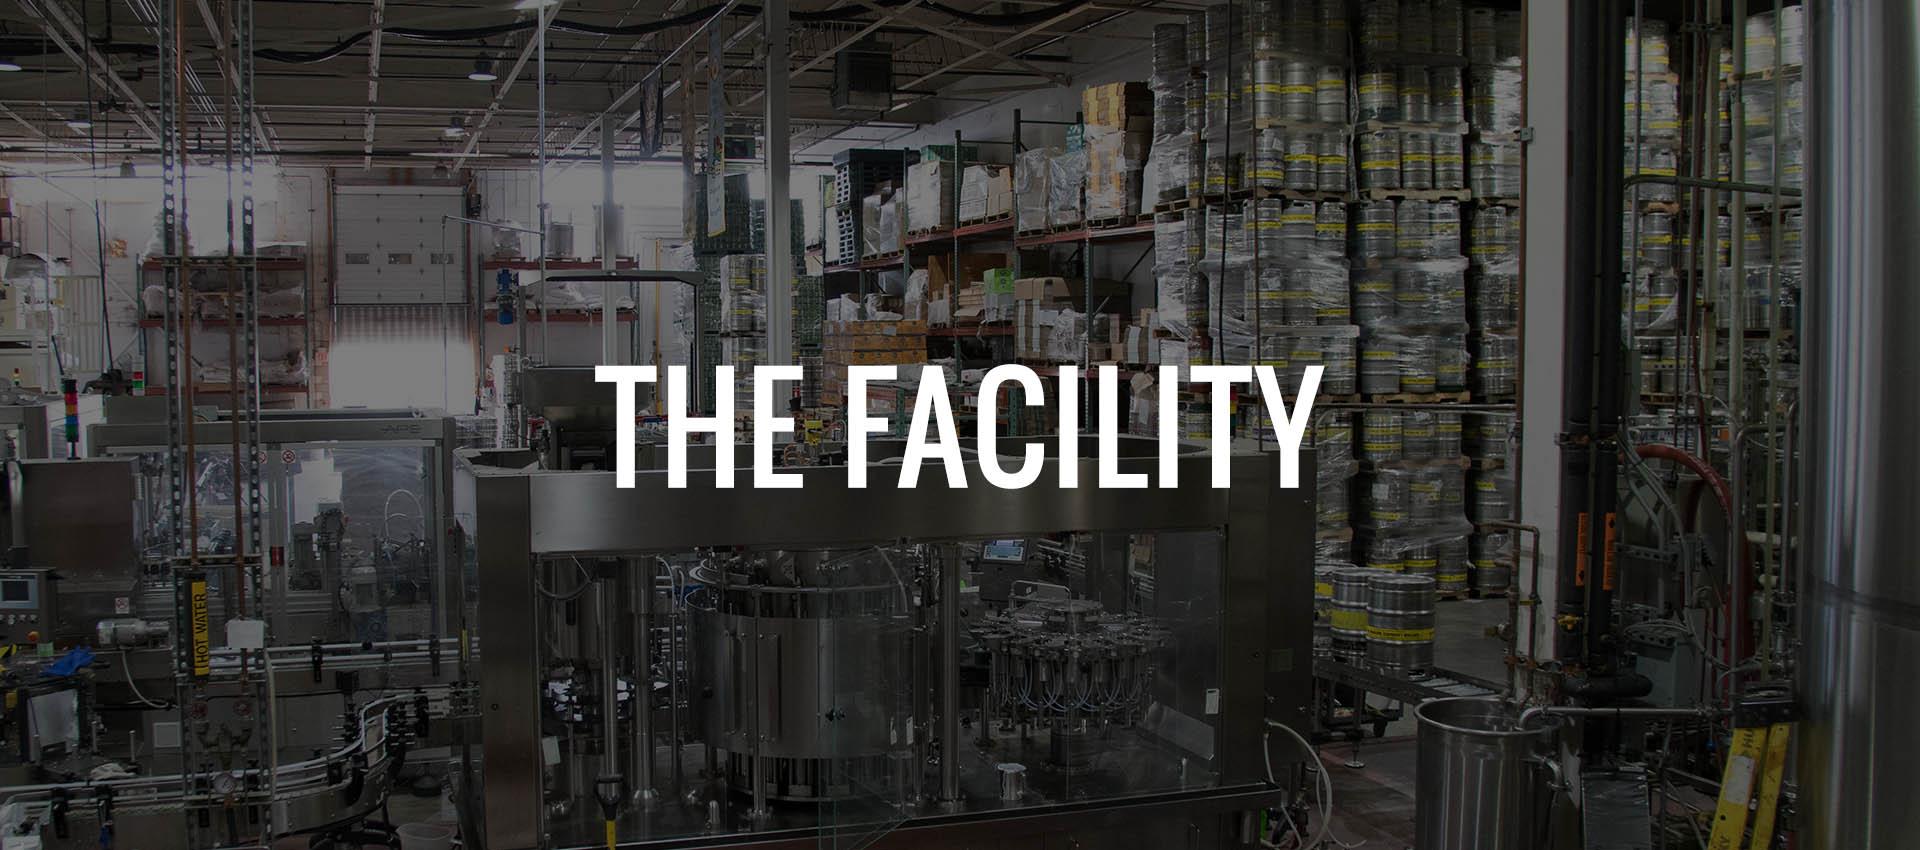 The Facility header